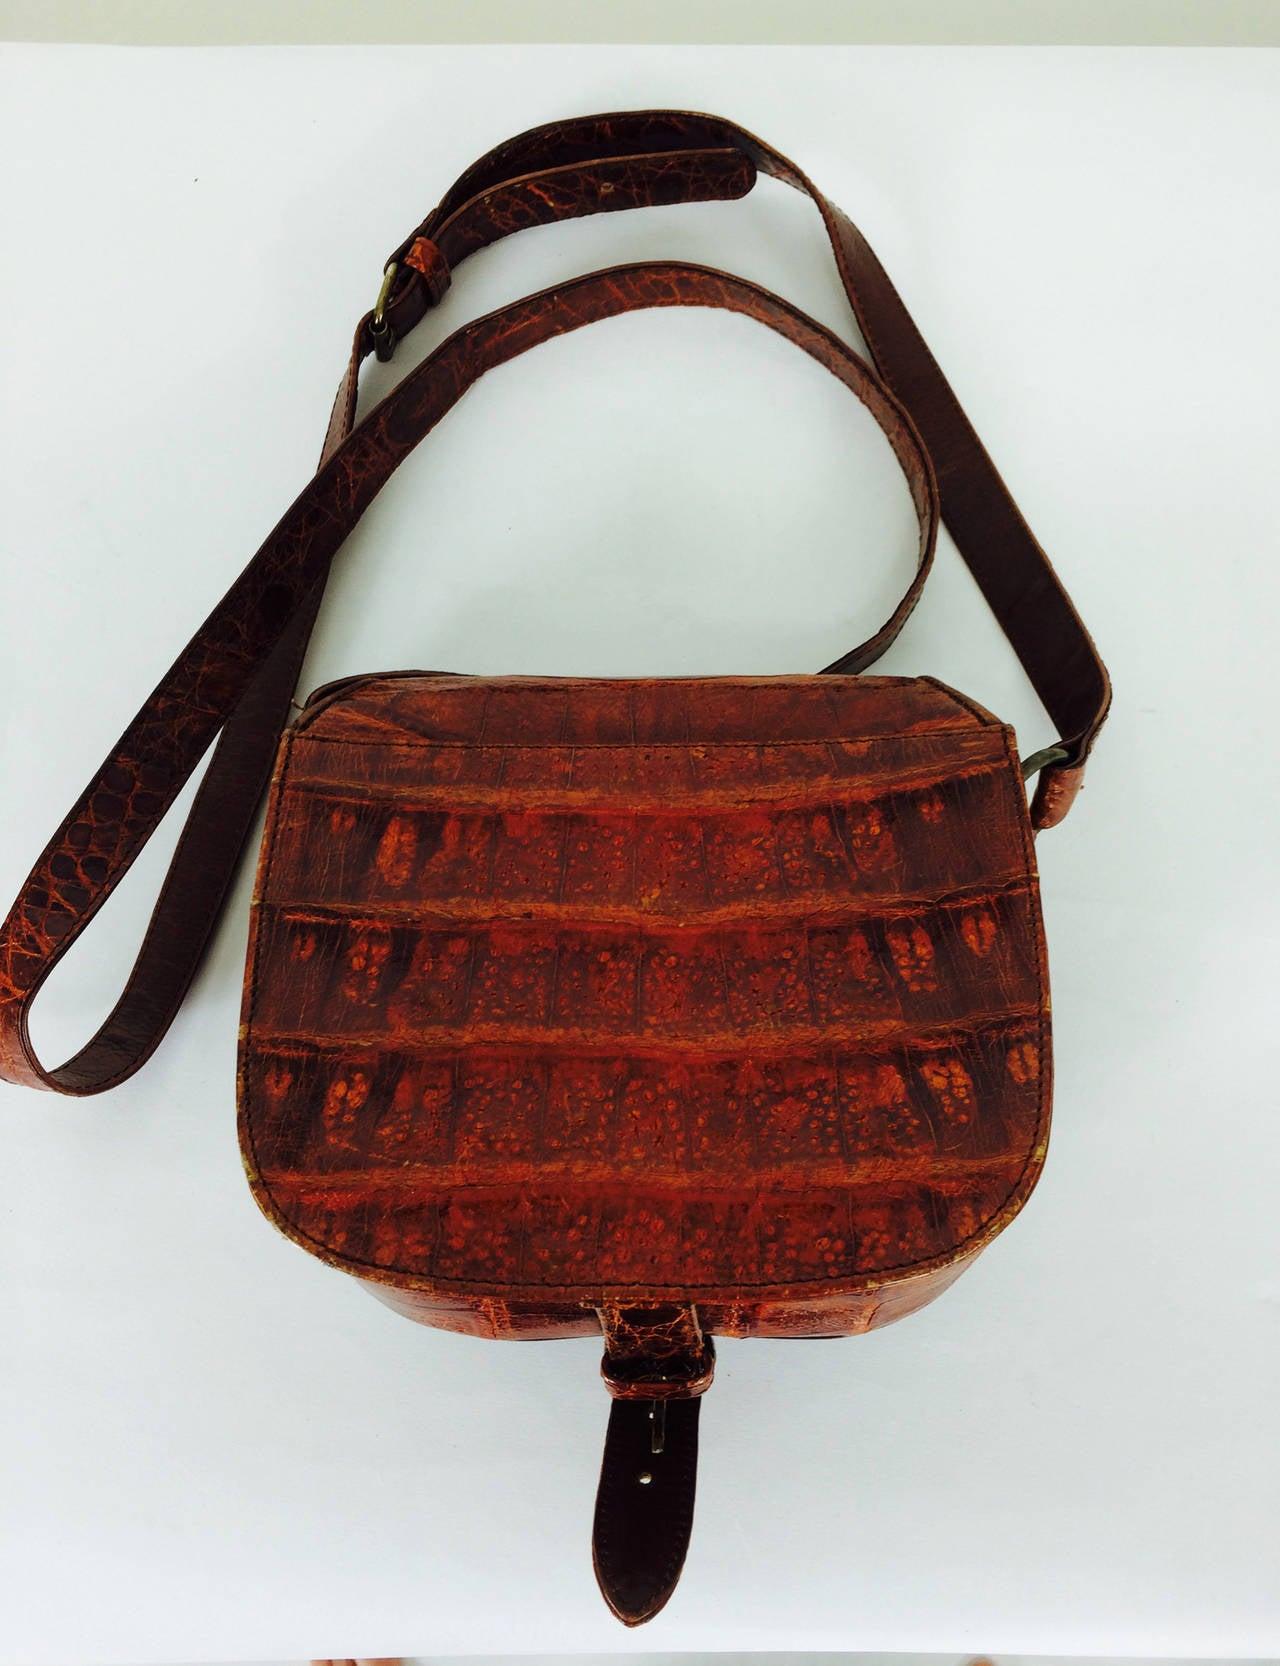 Saddle bag handbag cognac leather faux alligator Neiman Marcus 1980s 4